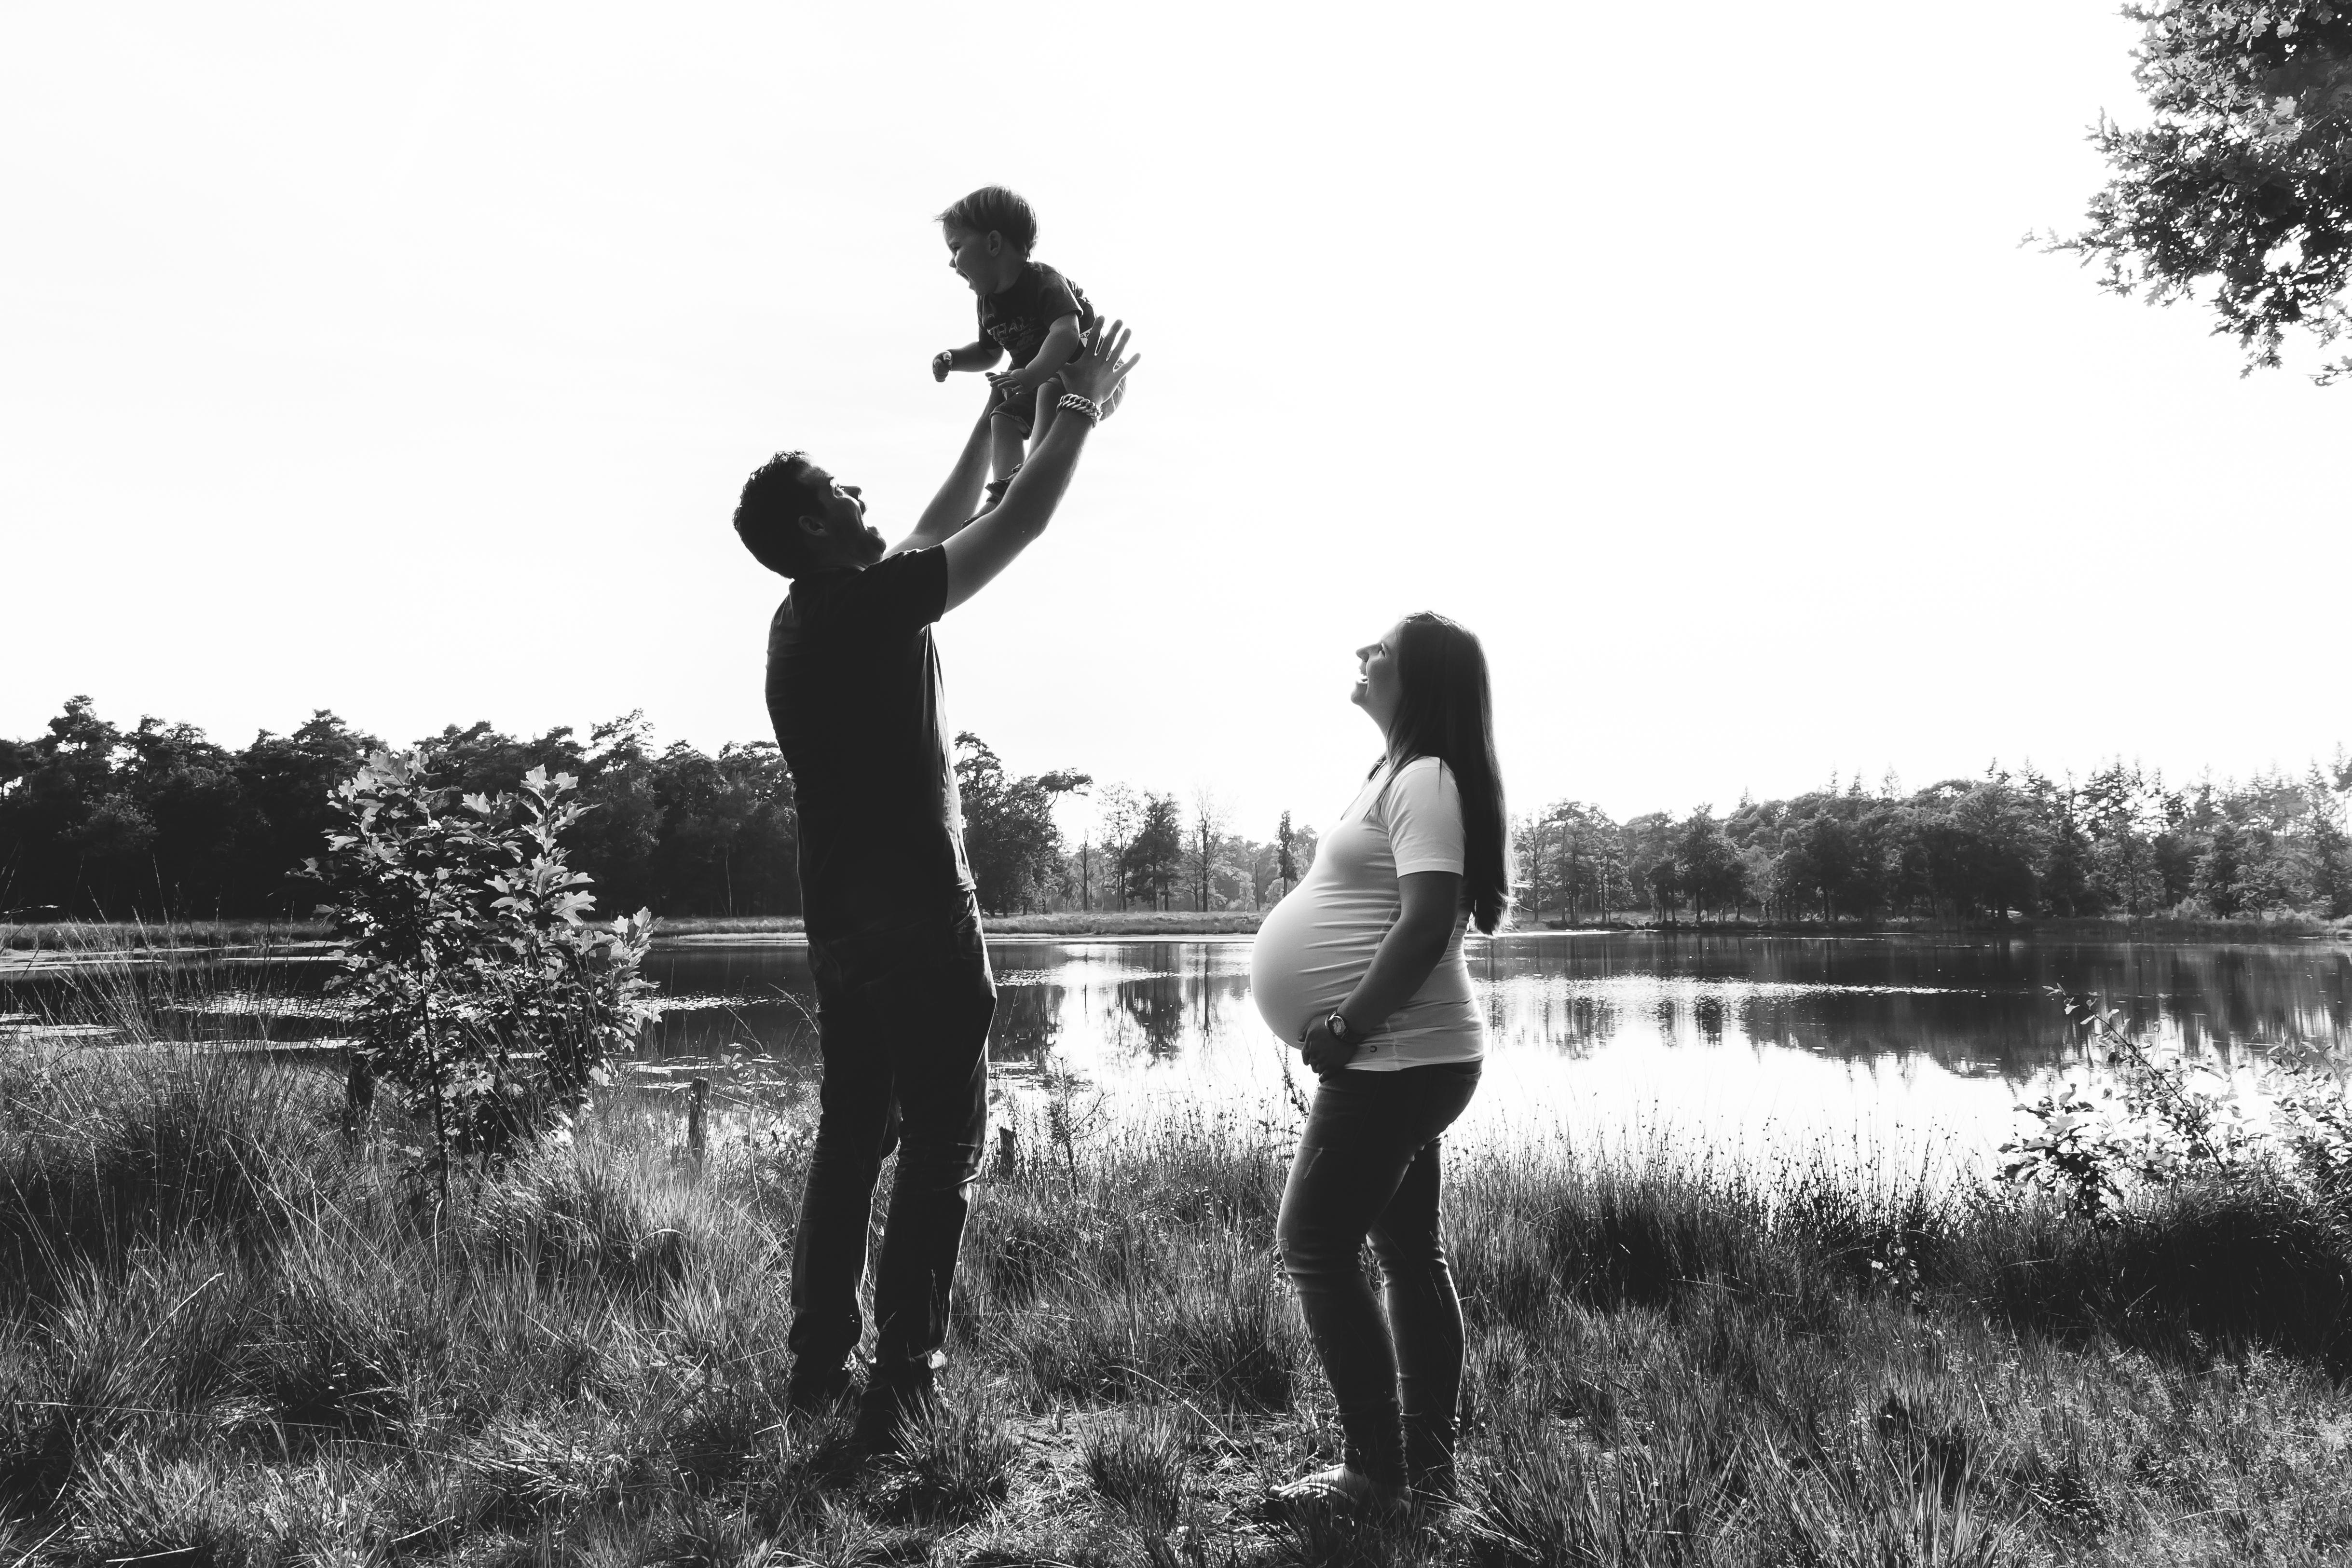 zwangerschapsfotografie – coupleshoot – kinderfotografie – gezinsfotografie